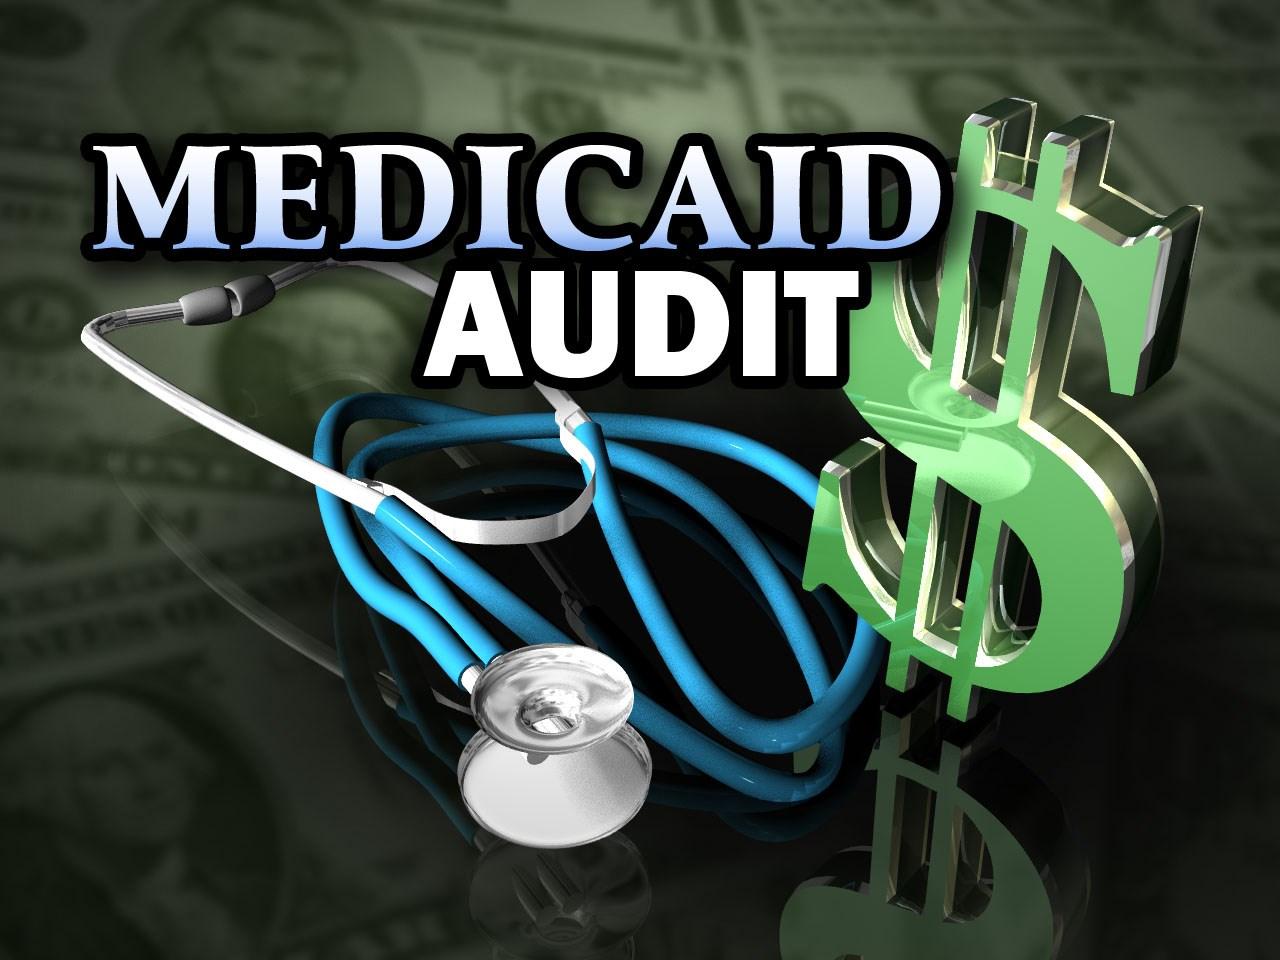 Medicaid audit_1553019441872.jpg.jpg